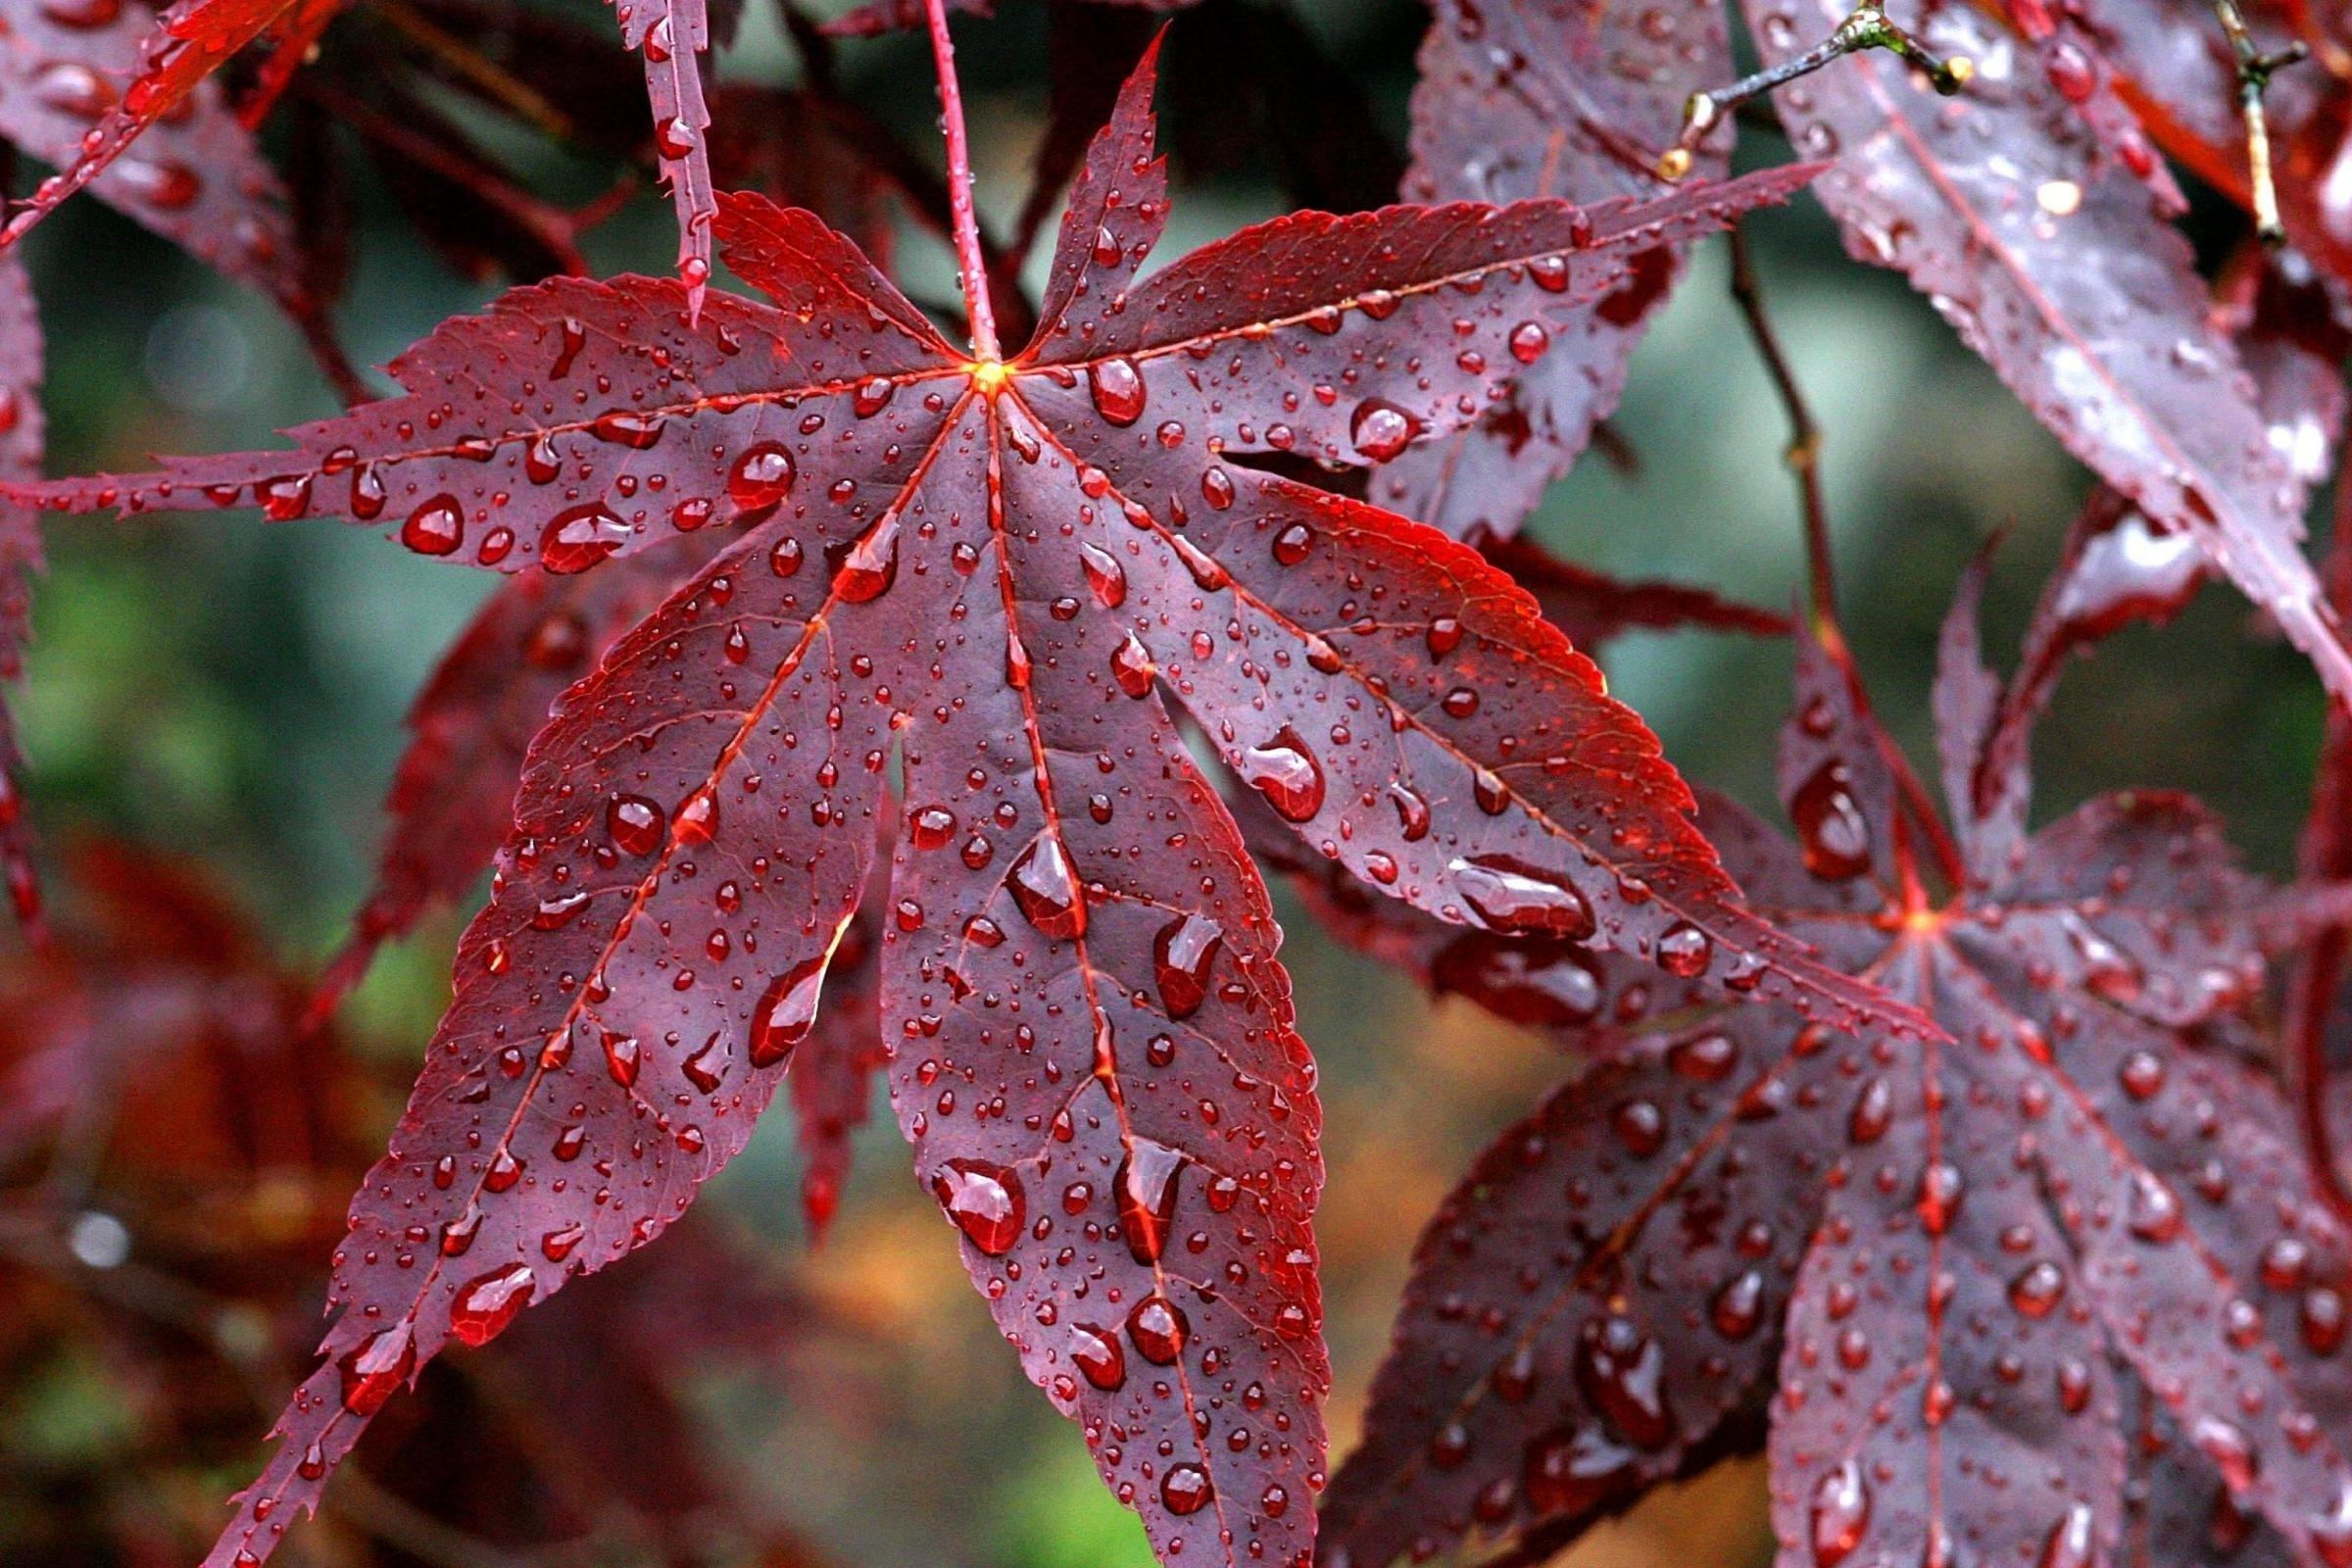 Drops Rain Veins Red Autumn Leaves Wallpaper